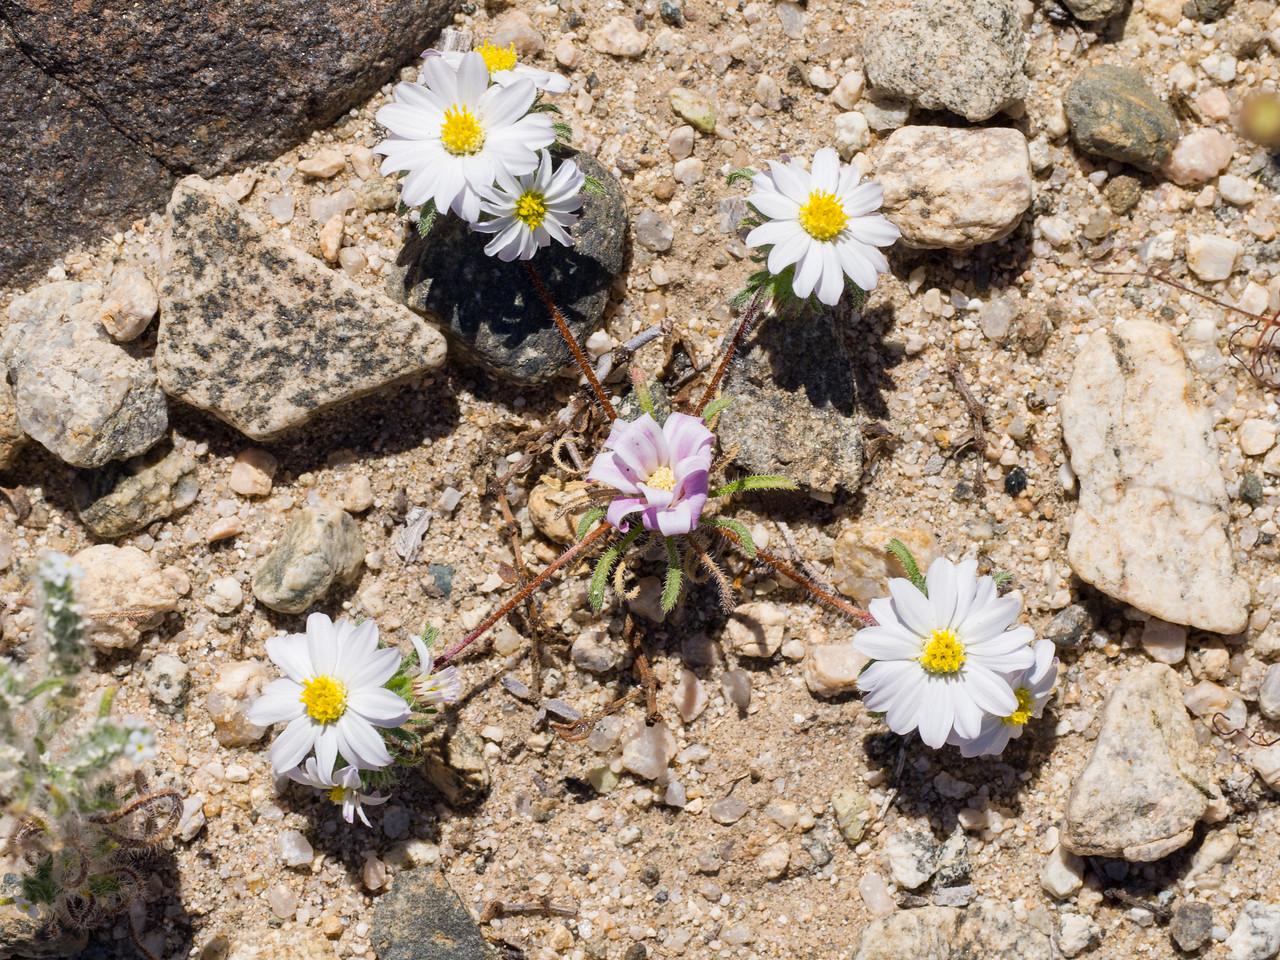 Desert star daisies in interesting formation.